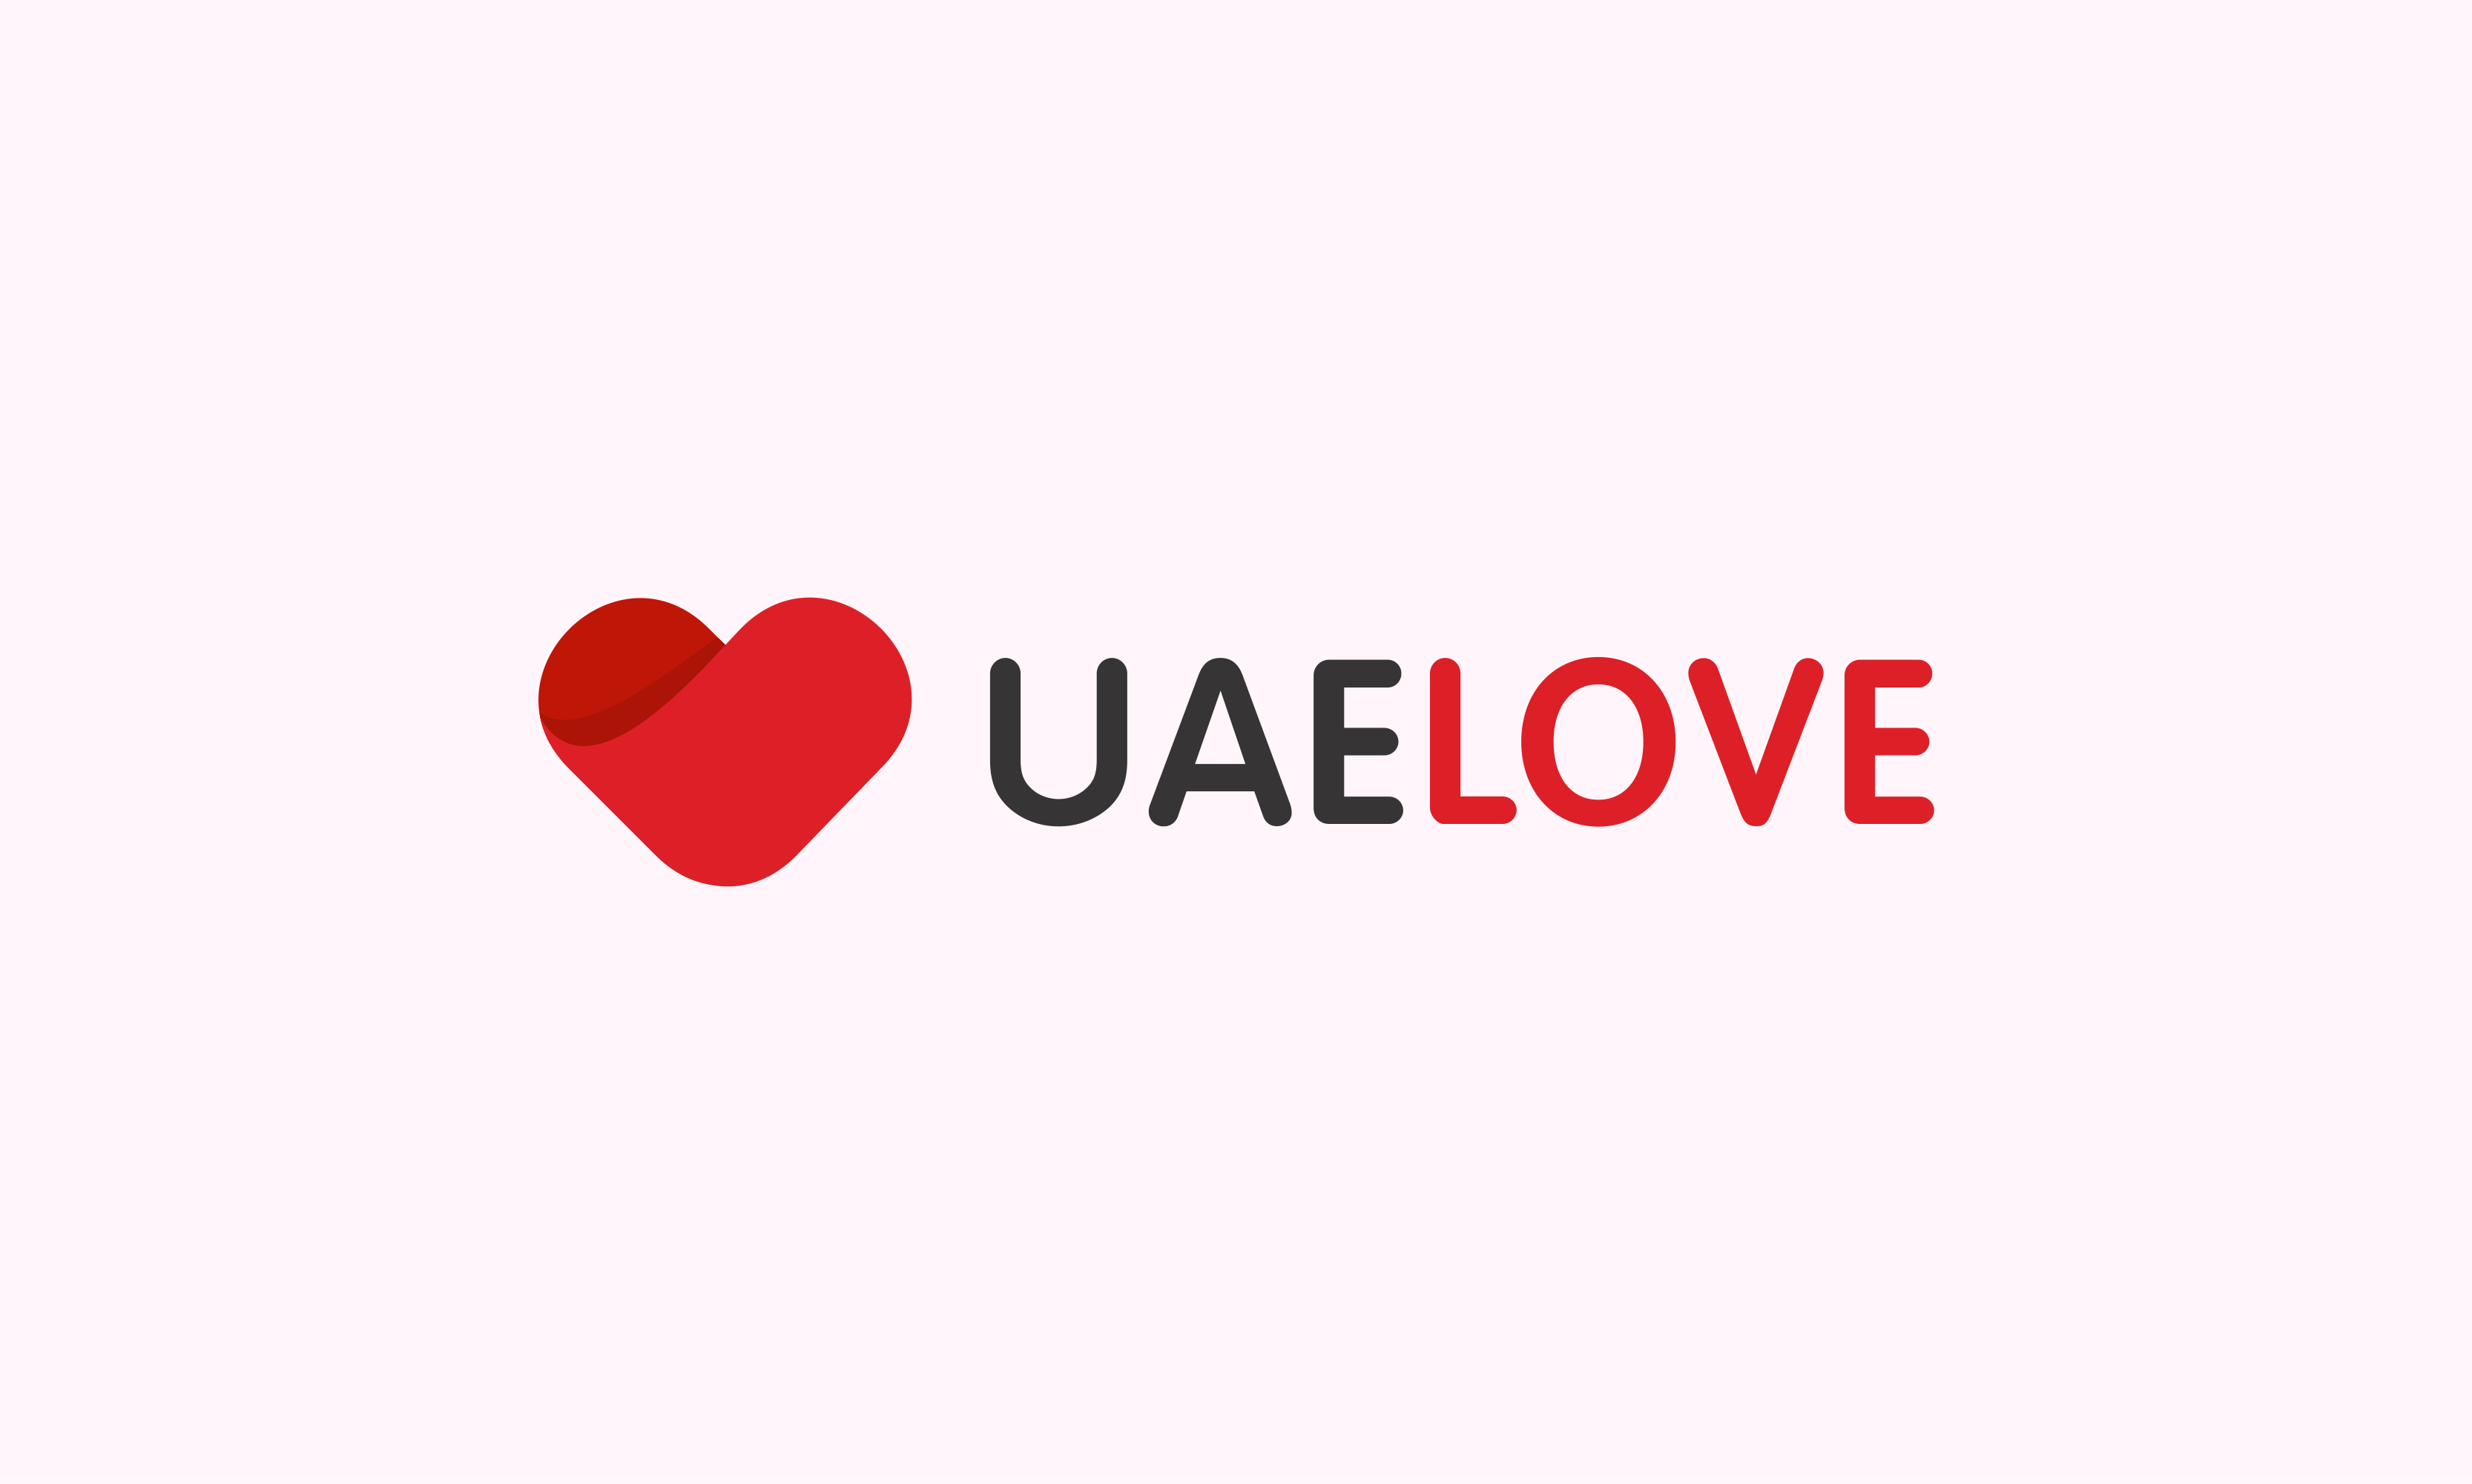 Uaelove